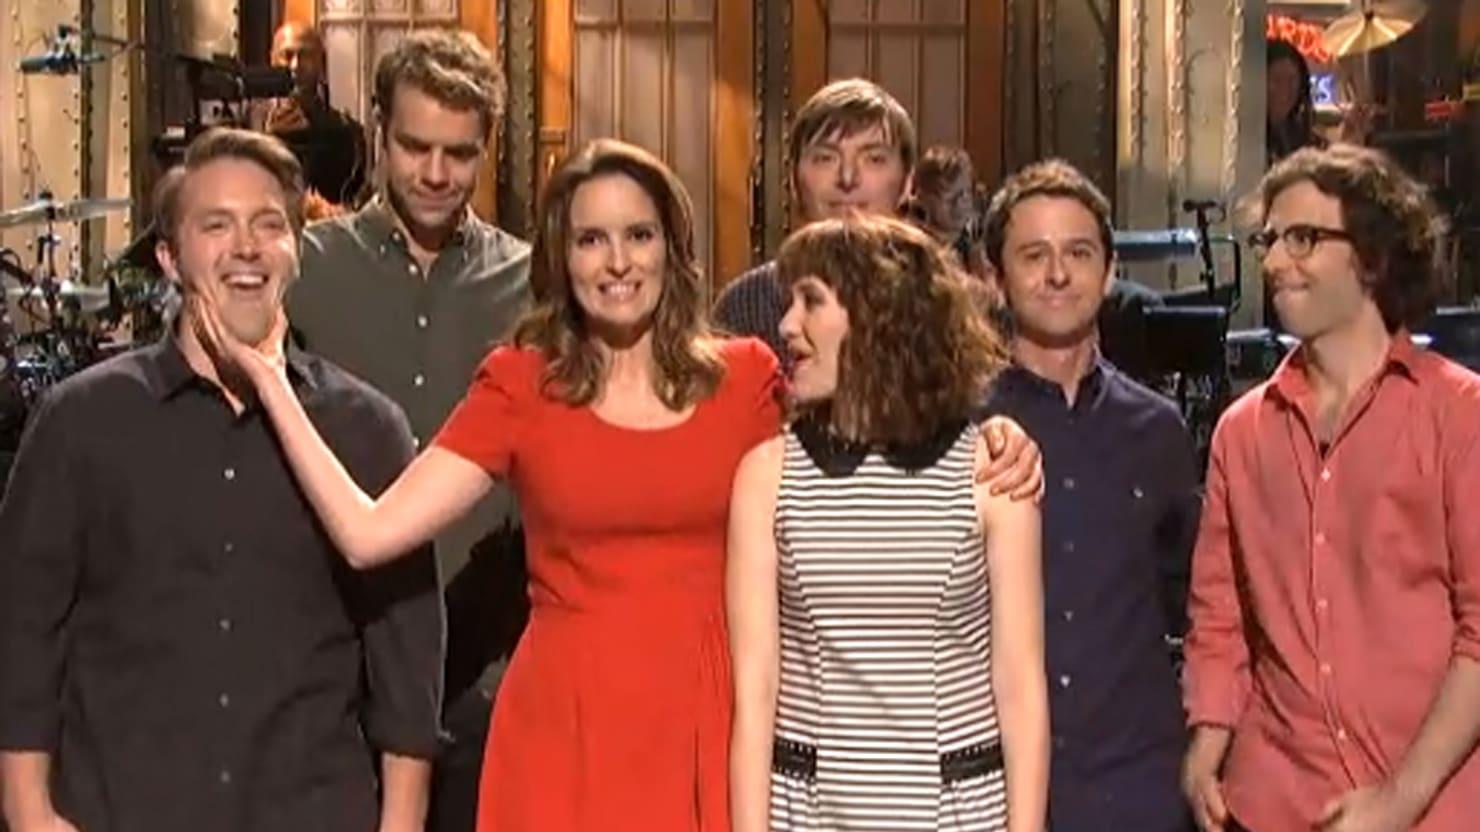 Saturday night live past cast members